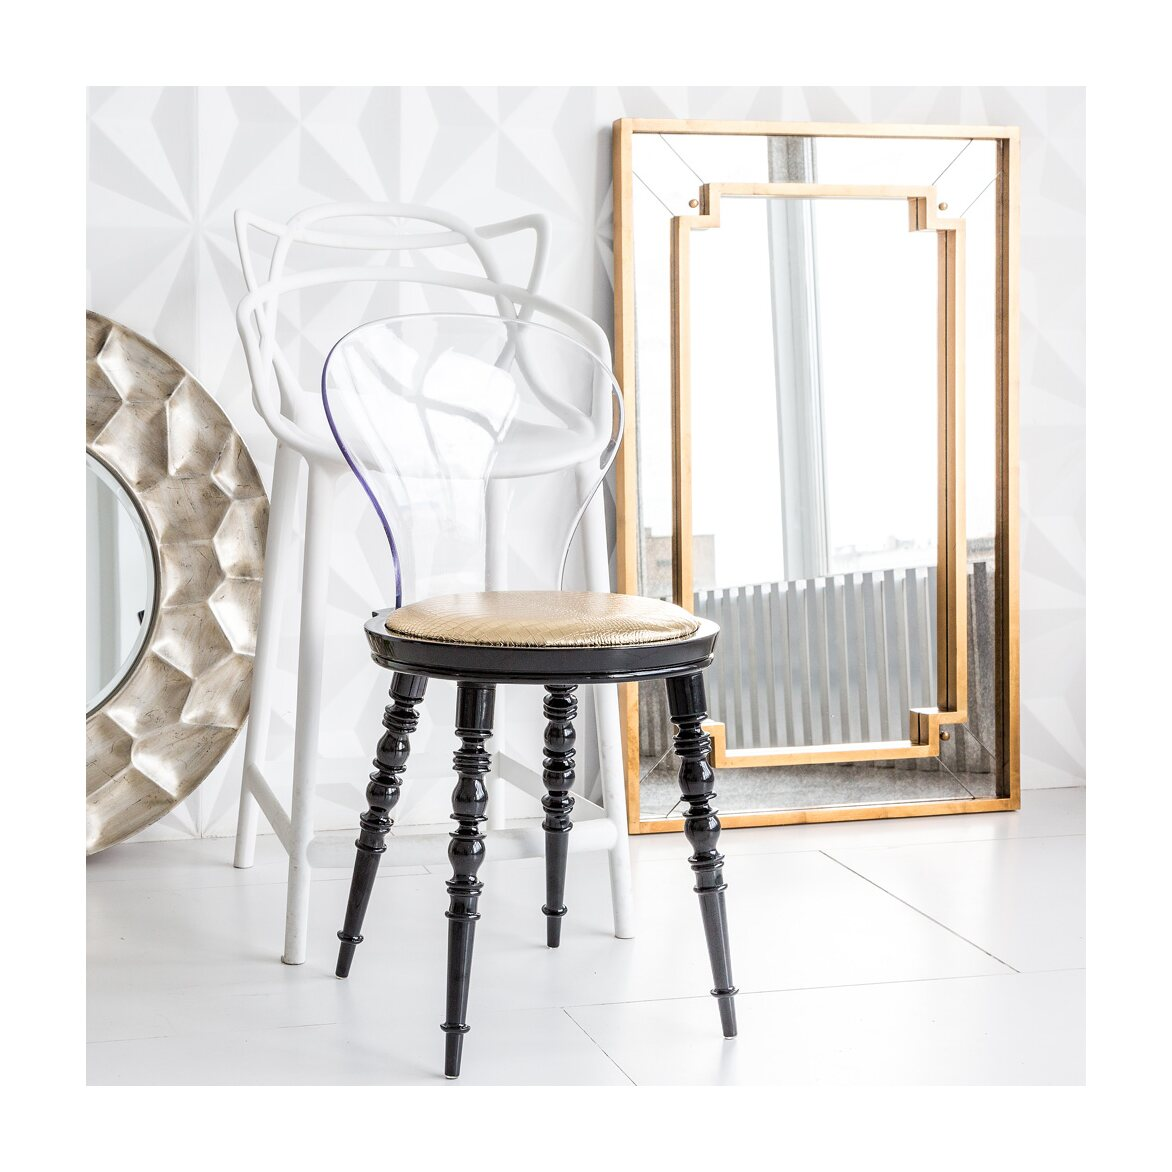 Настенное зеркало «Саттон» 4 | Настенные зеркала Kingsby